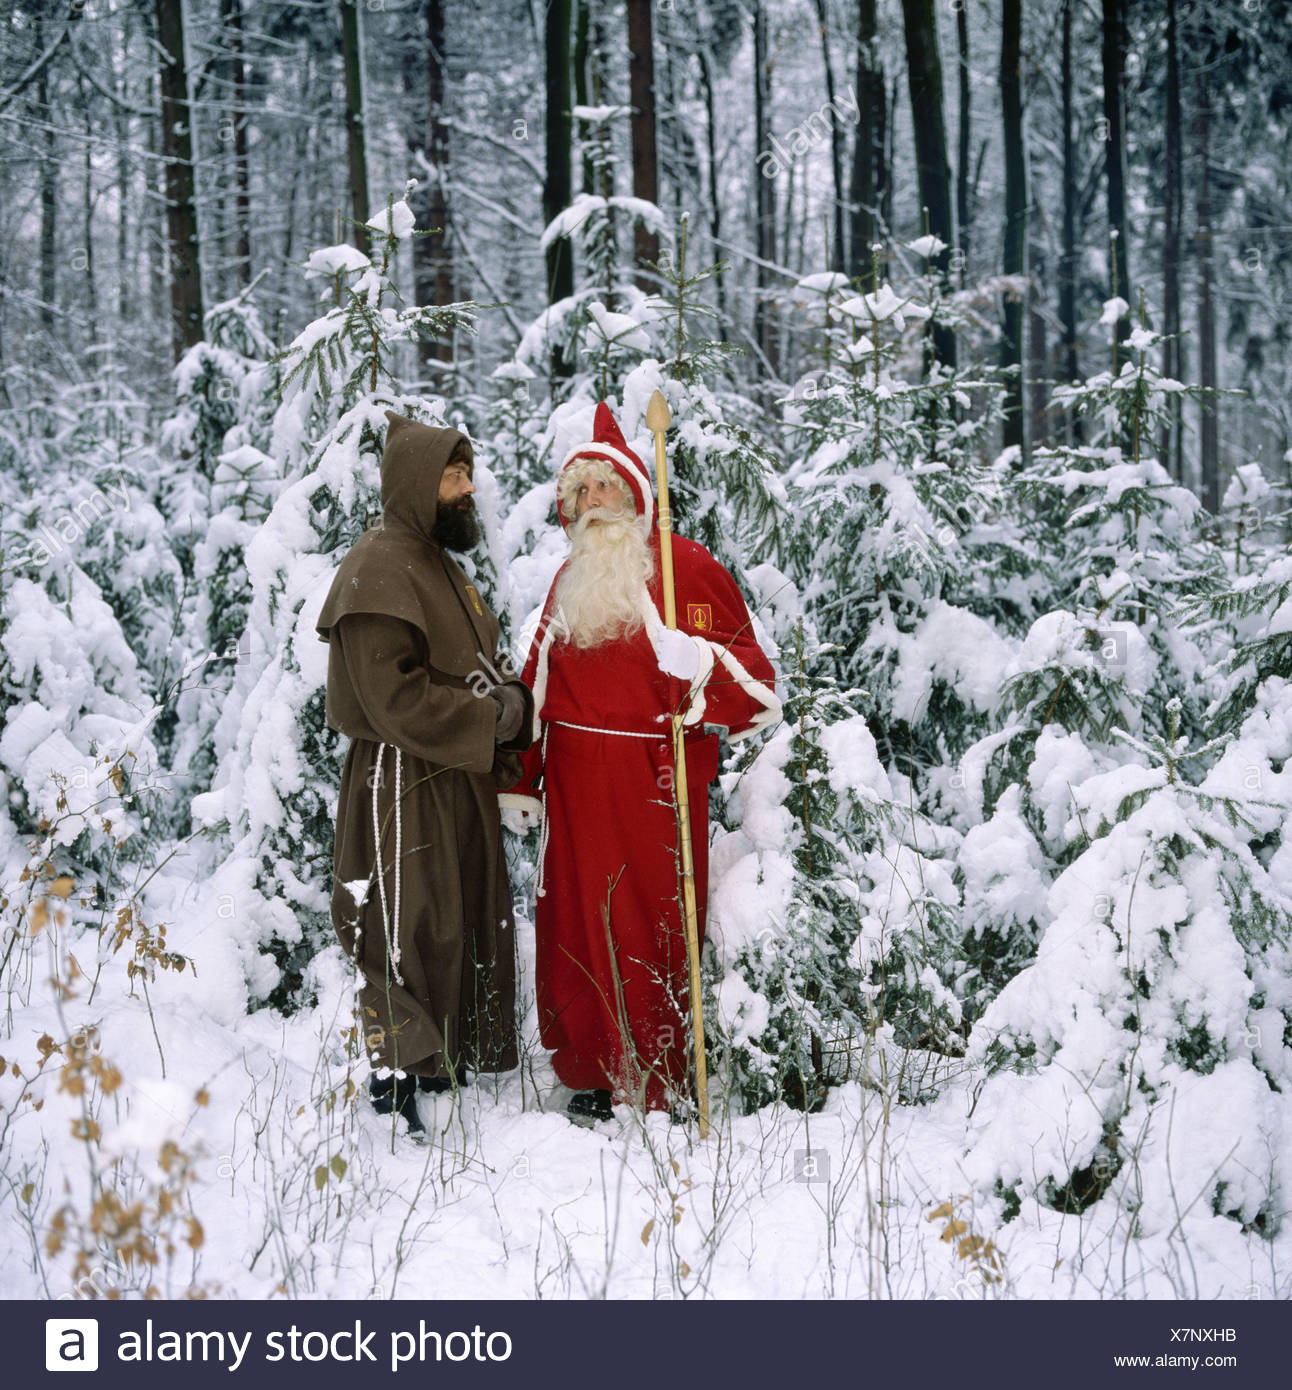 Santa Claus außerhalb Knecht Knecht Ruprecht Schmutzli Schnee St. Niklaus Holz Wald Winterschnee Stockbild